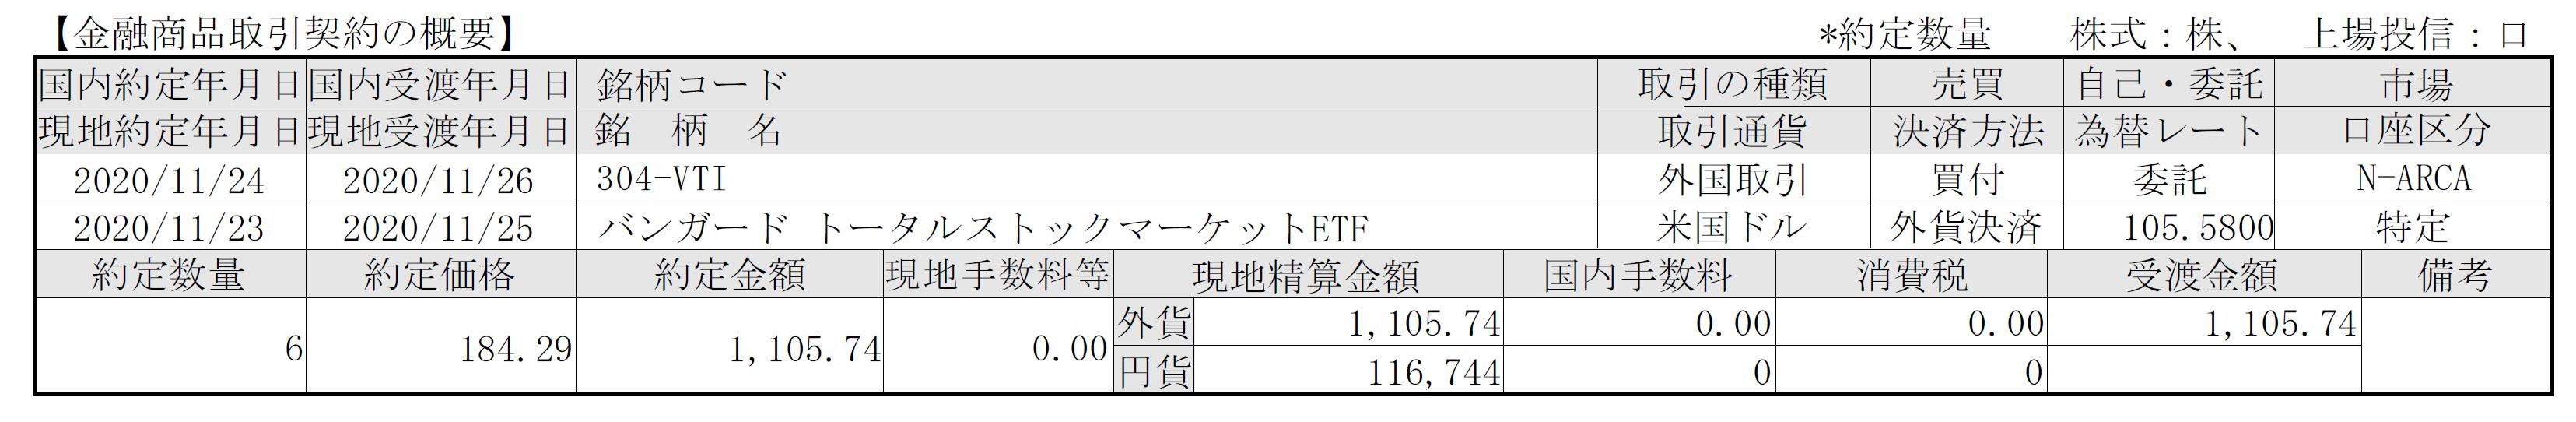 f:id:hodo-work:20201126102856p:plain